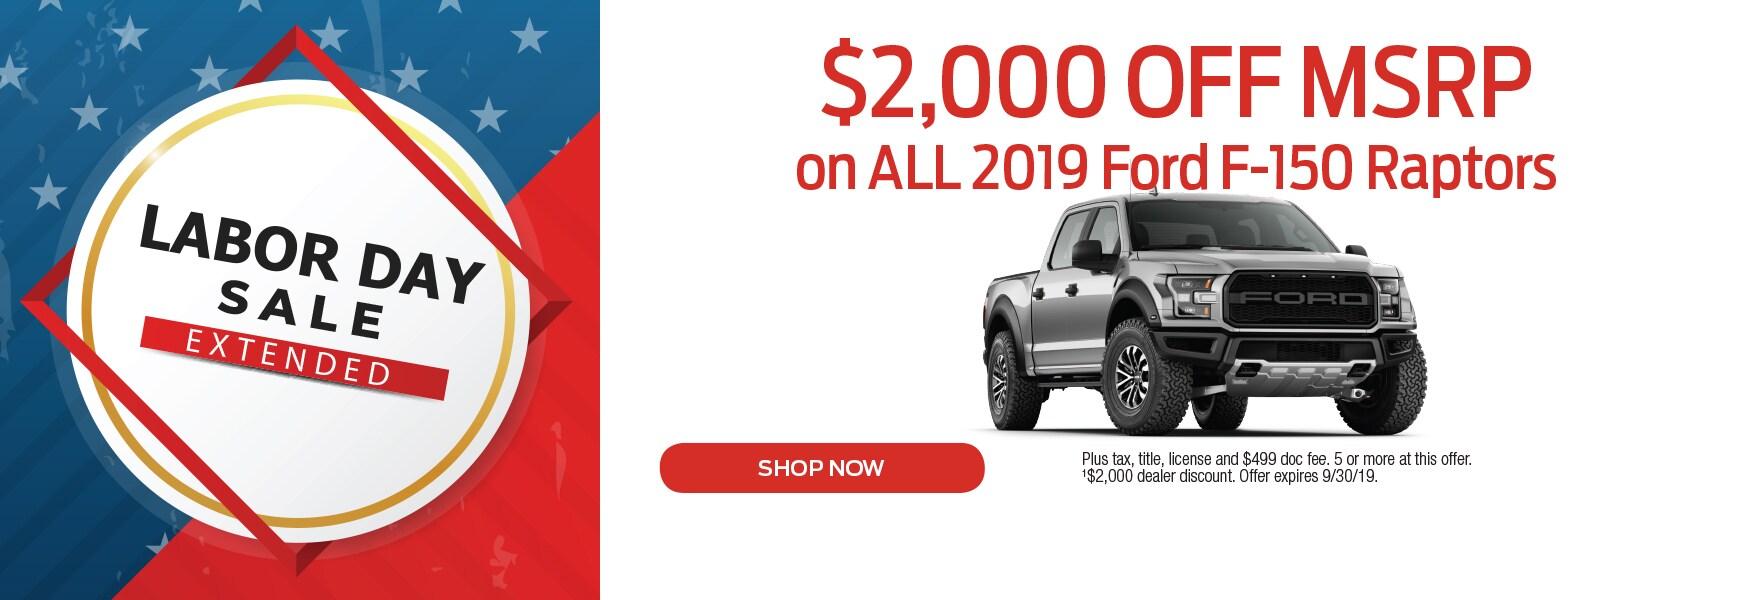 Camelback Ford | New & Used Cars, Trucks, SUVs & Vans